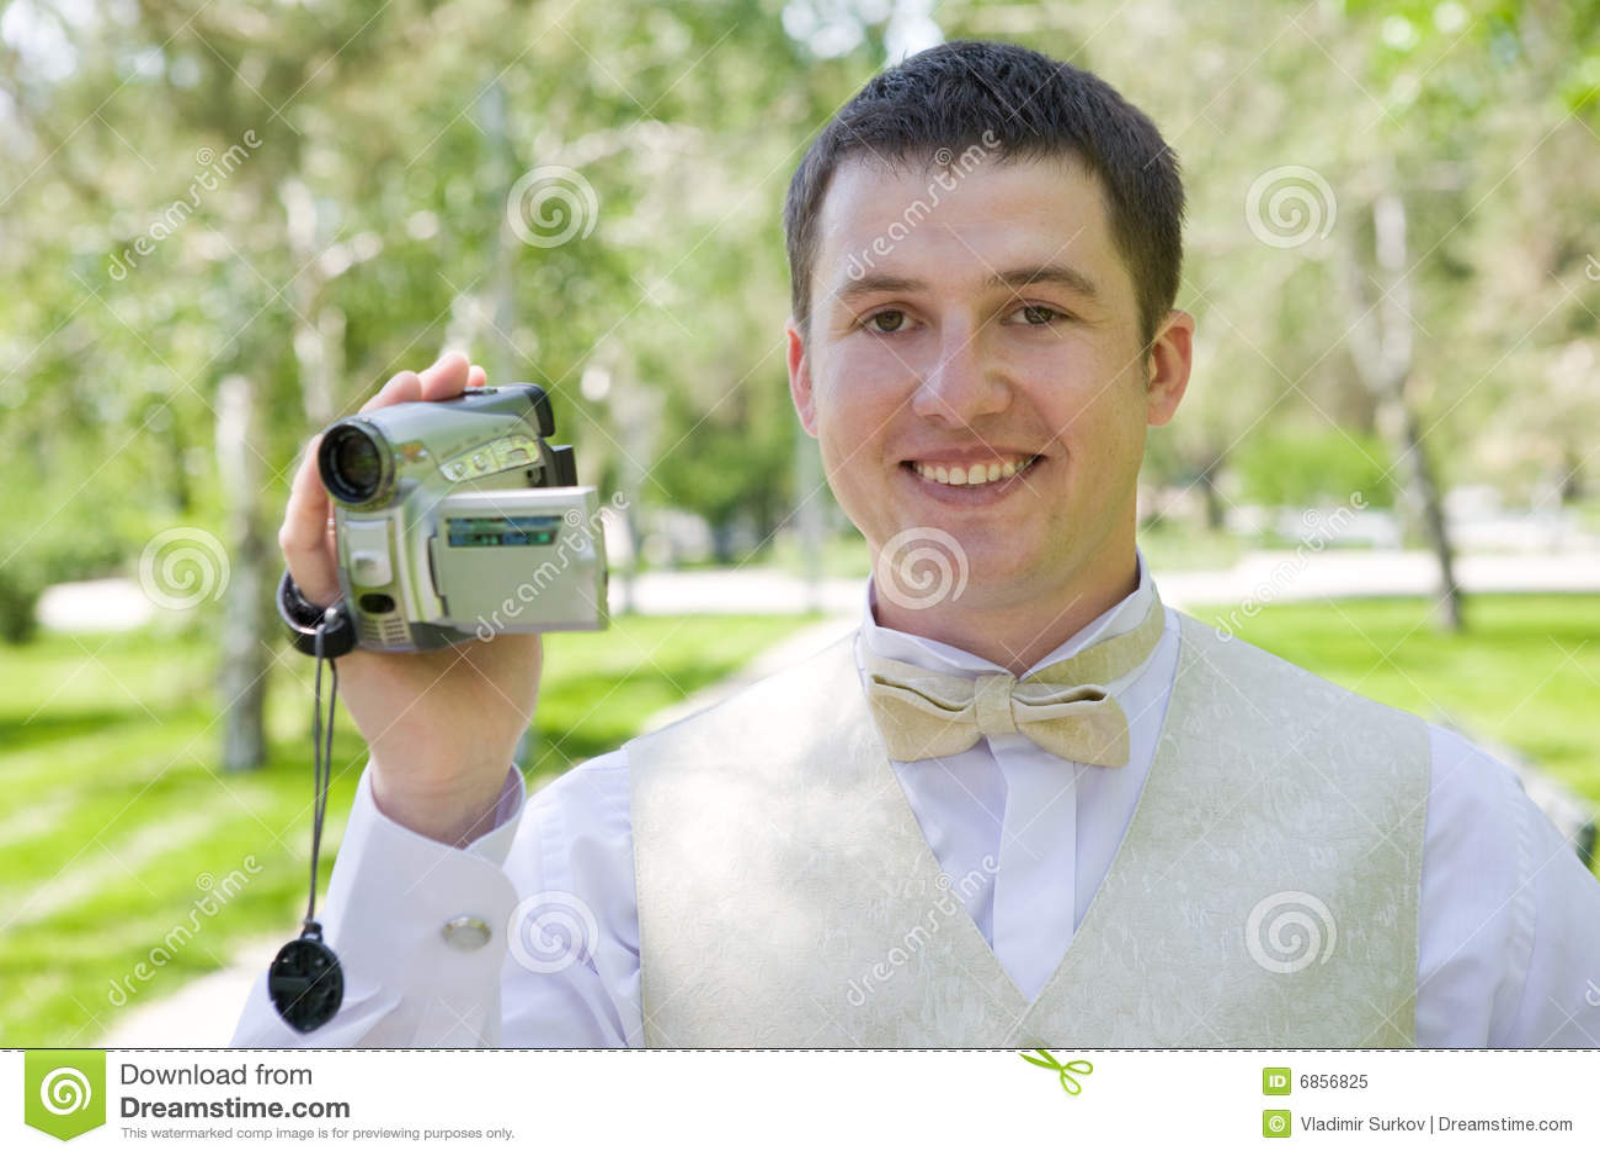 Videocamera человека